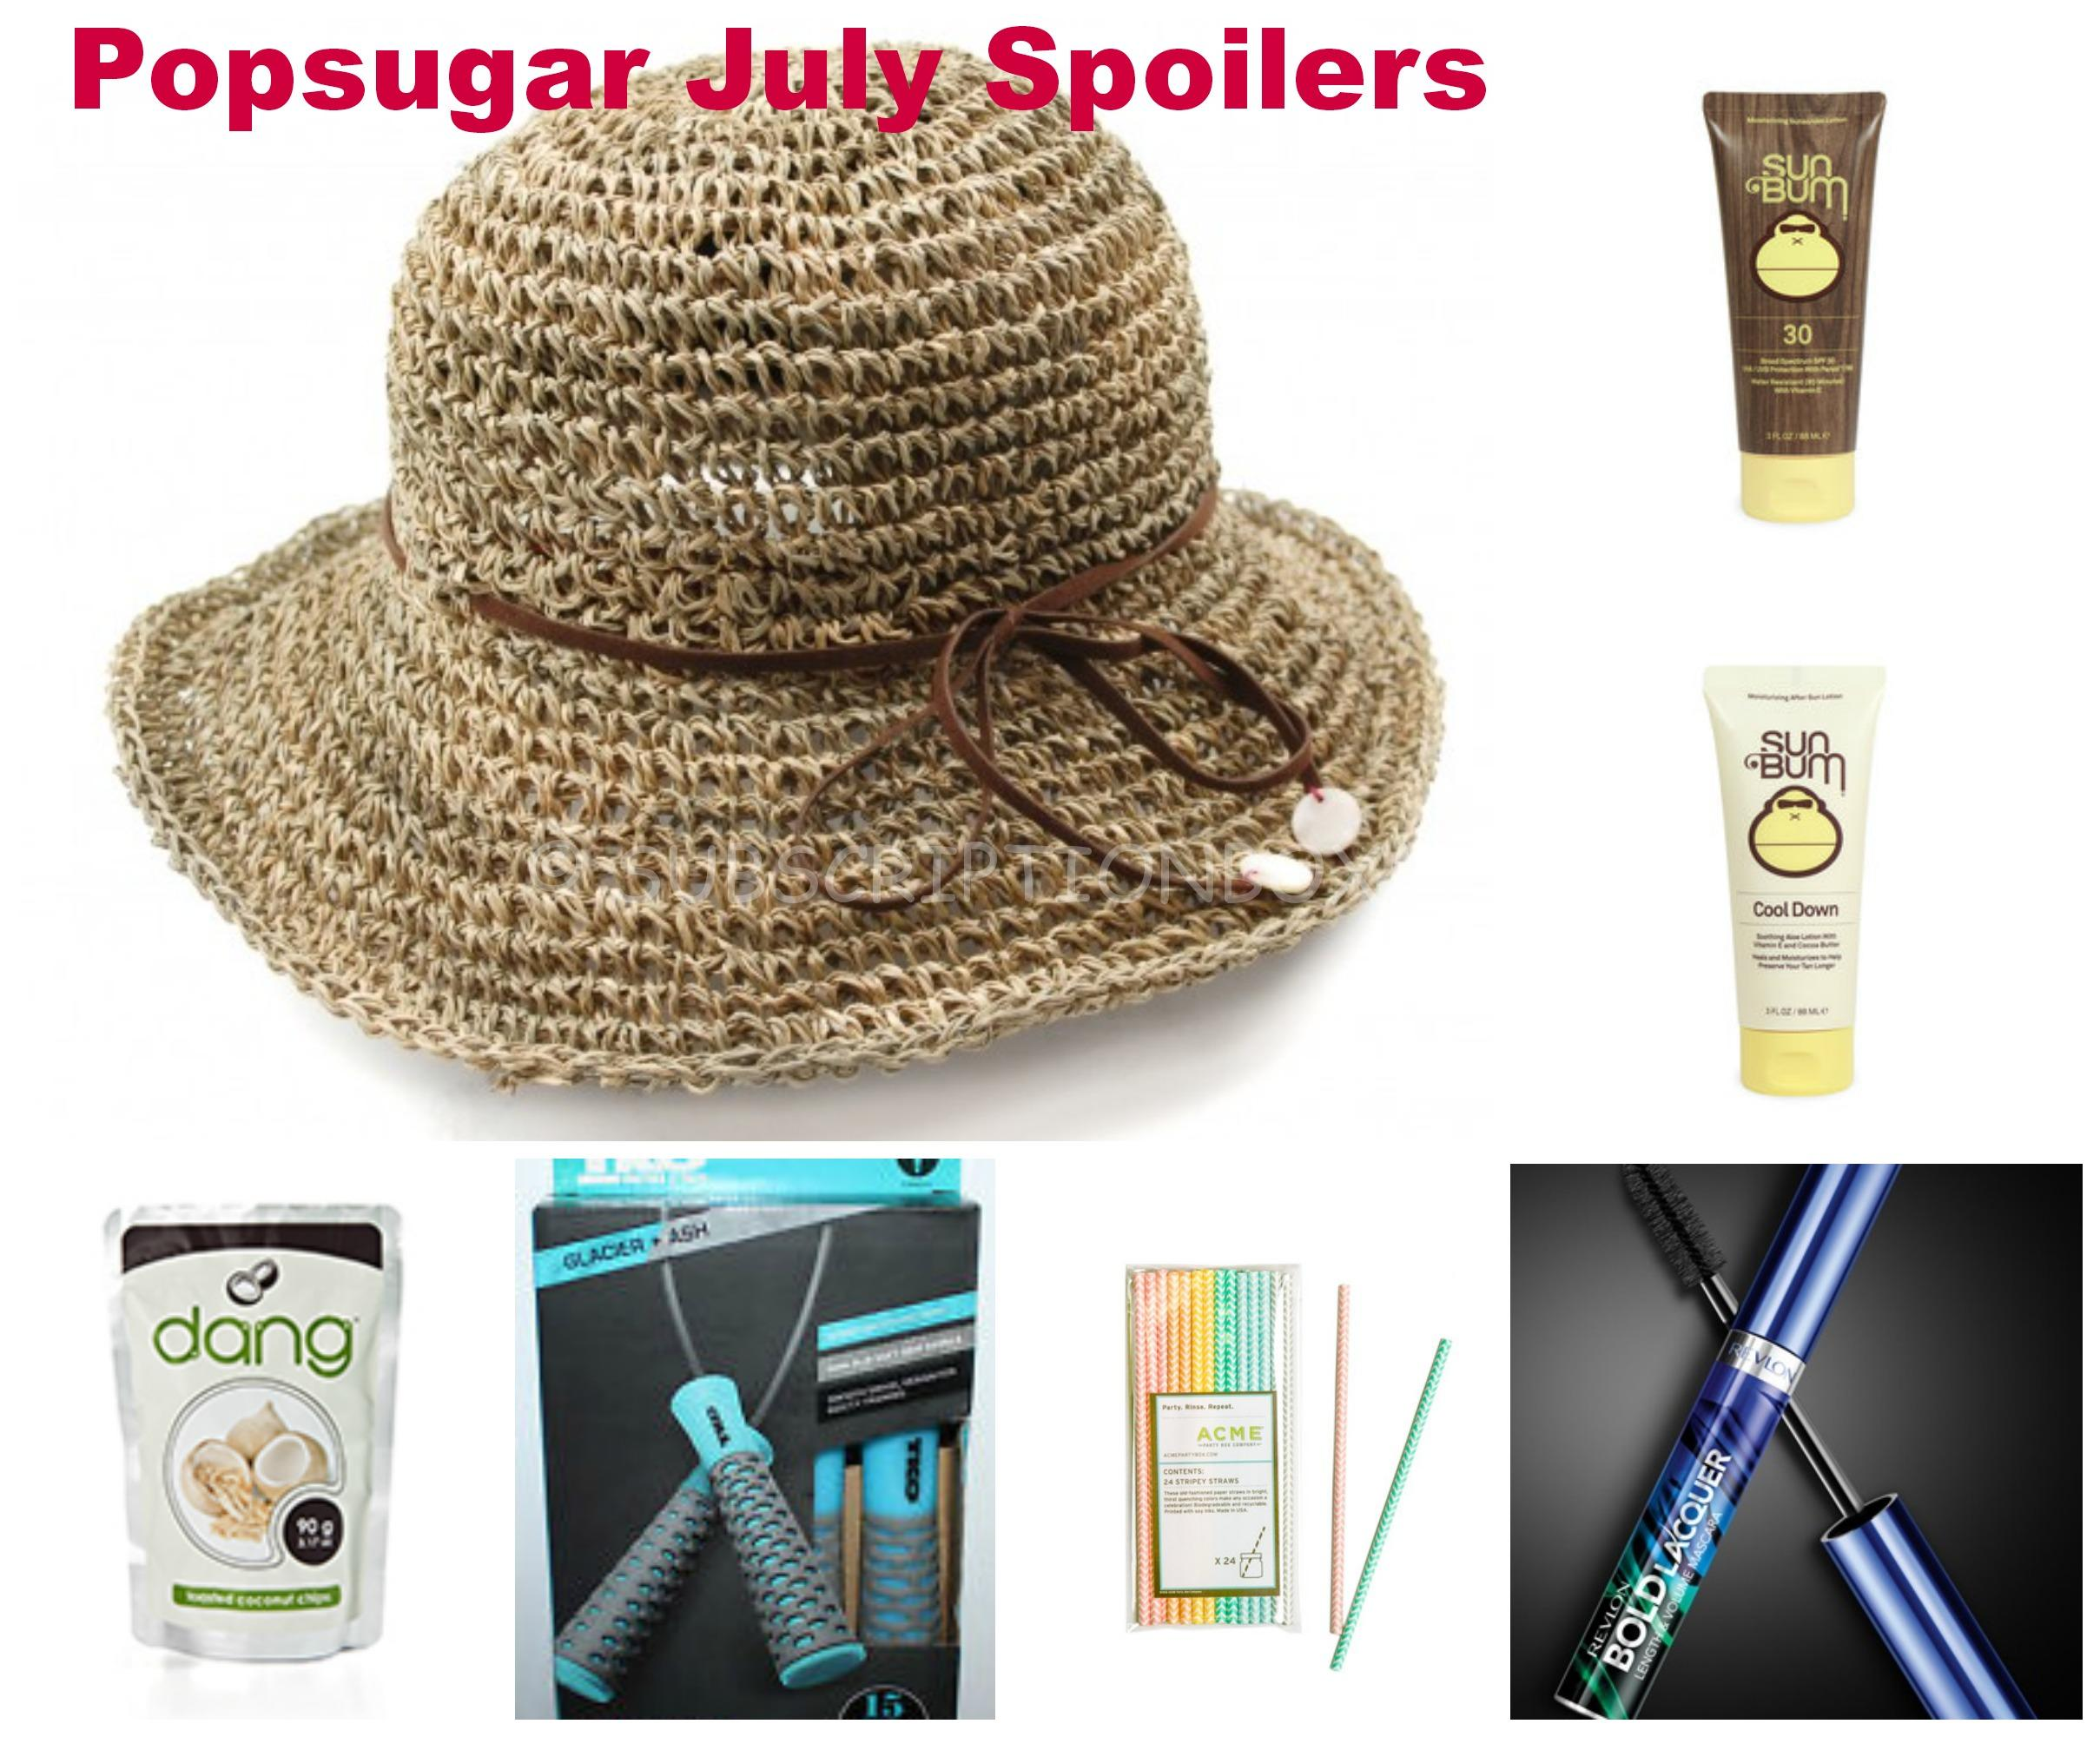 Popsugar July 2014 Spoilers